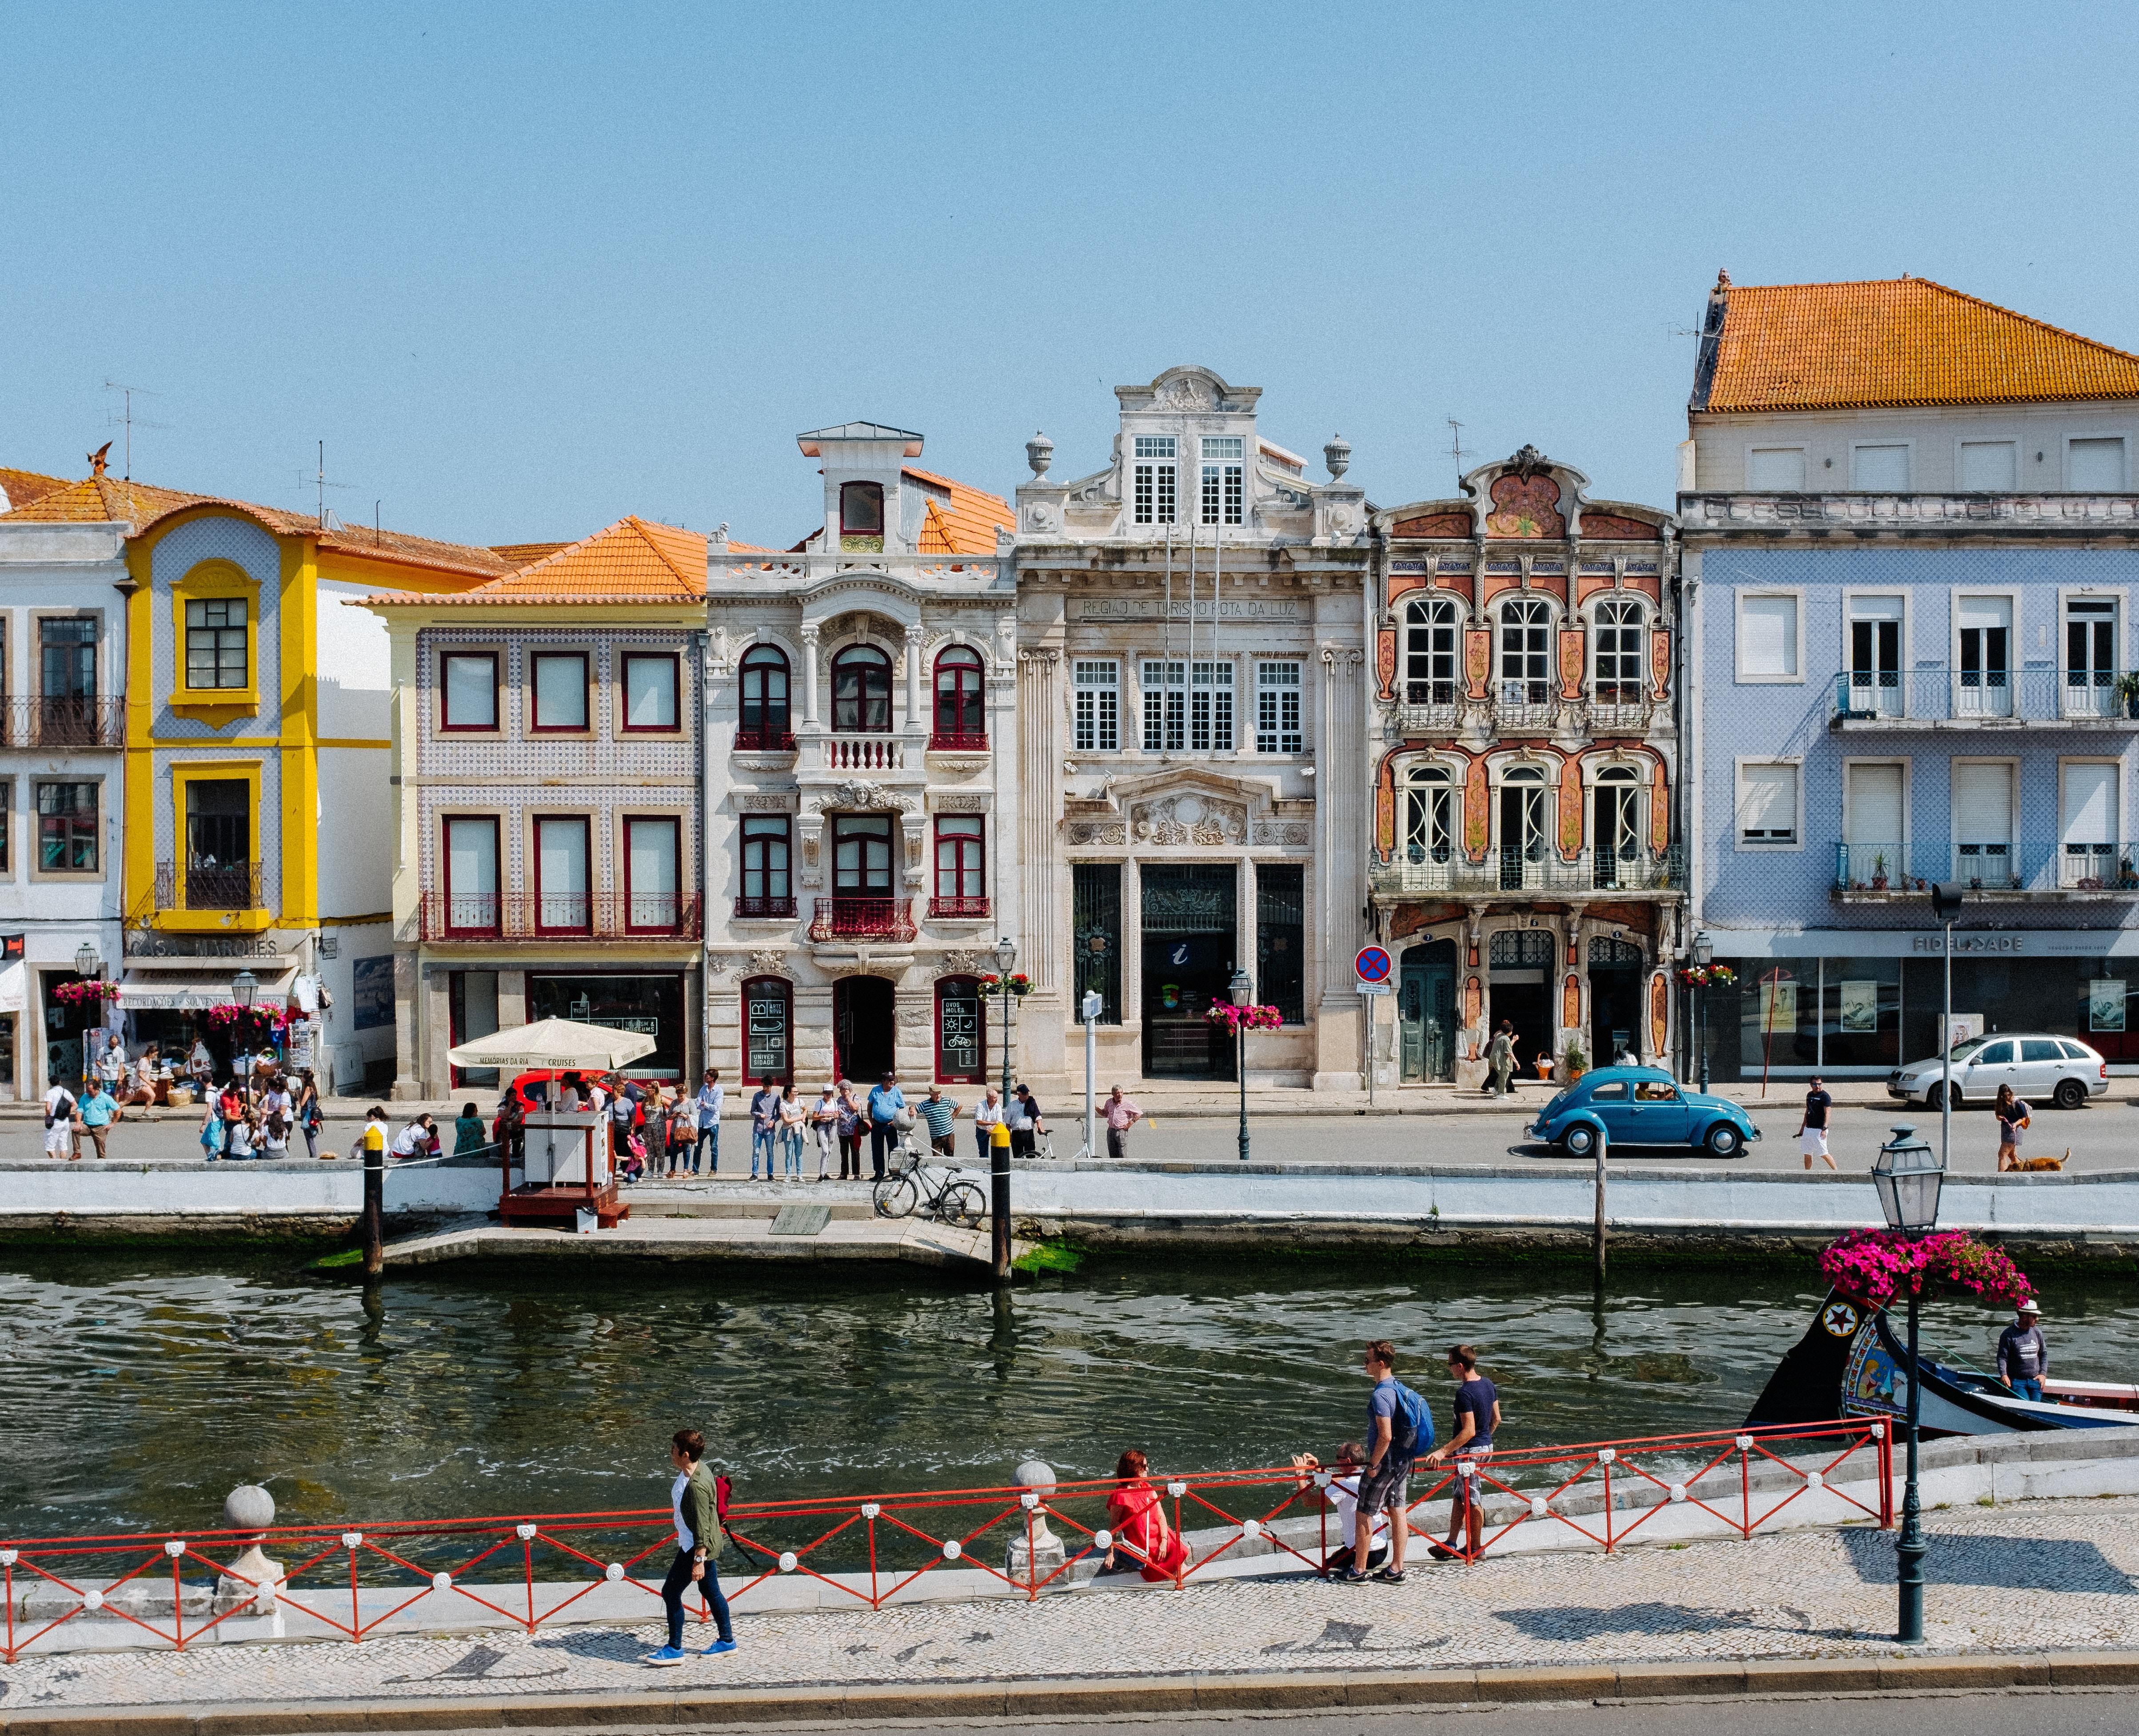 ricardo resende swivynstICo unsplash - Португалия - страна мечты!